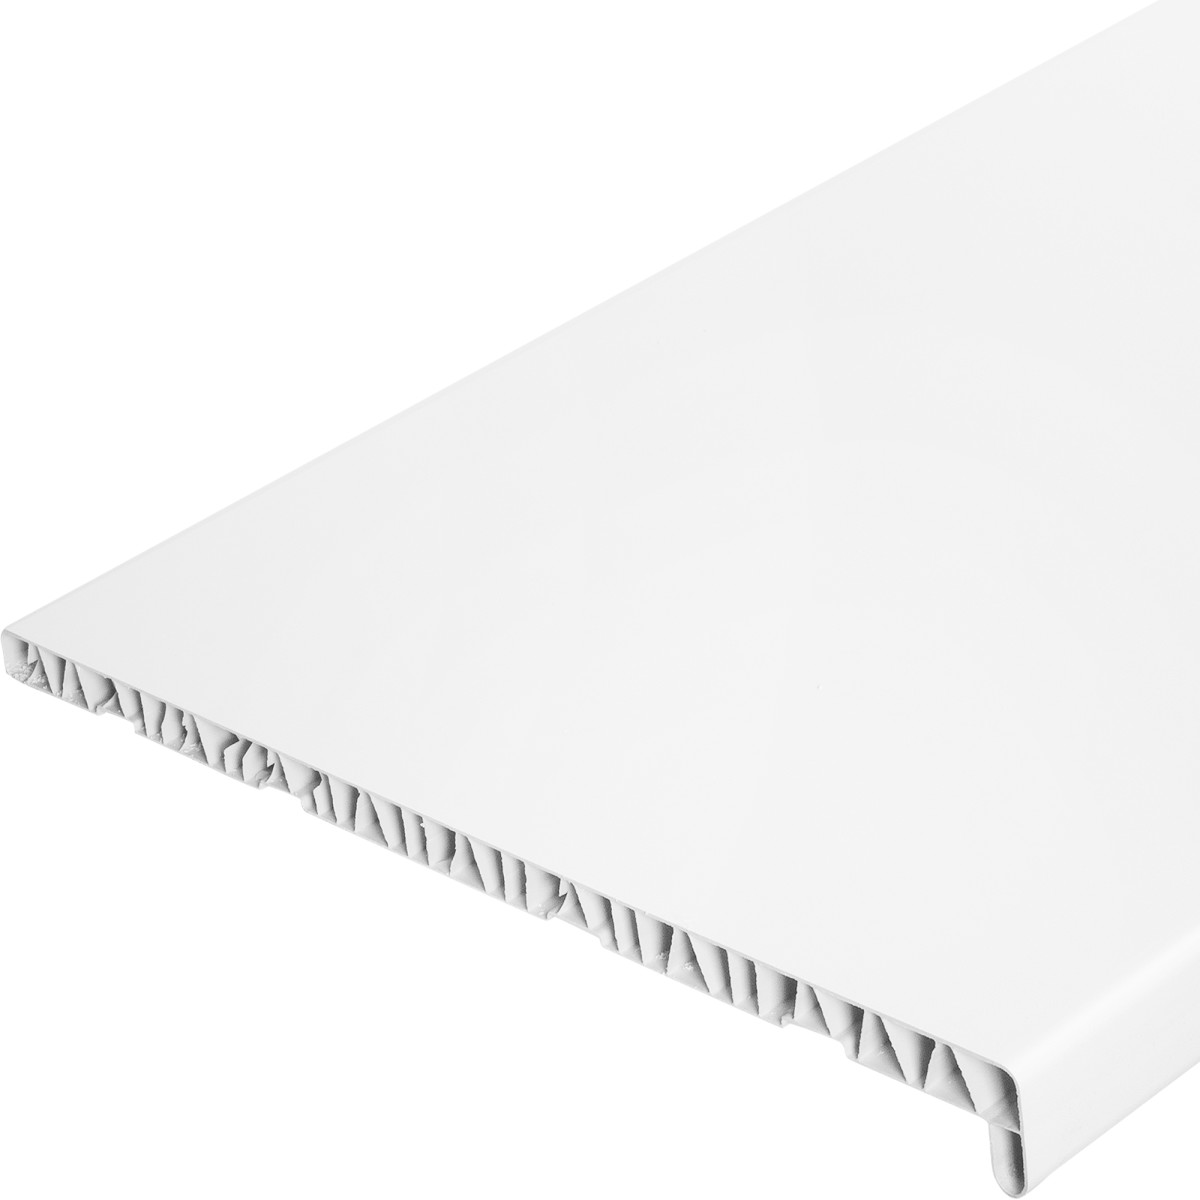 Подоконник ПВХ 500x1500 мм цвет белый